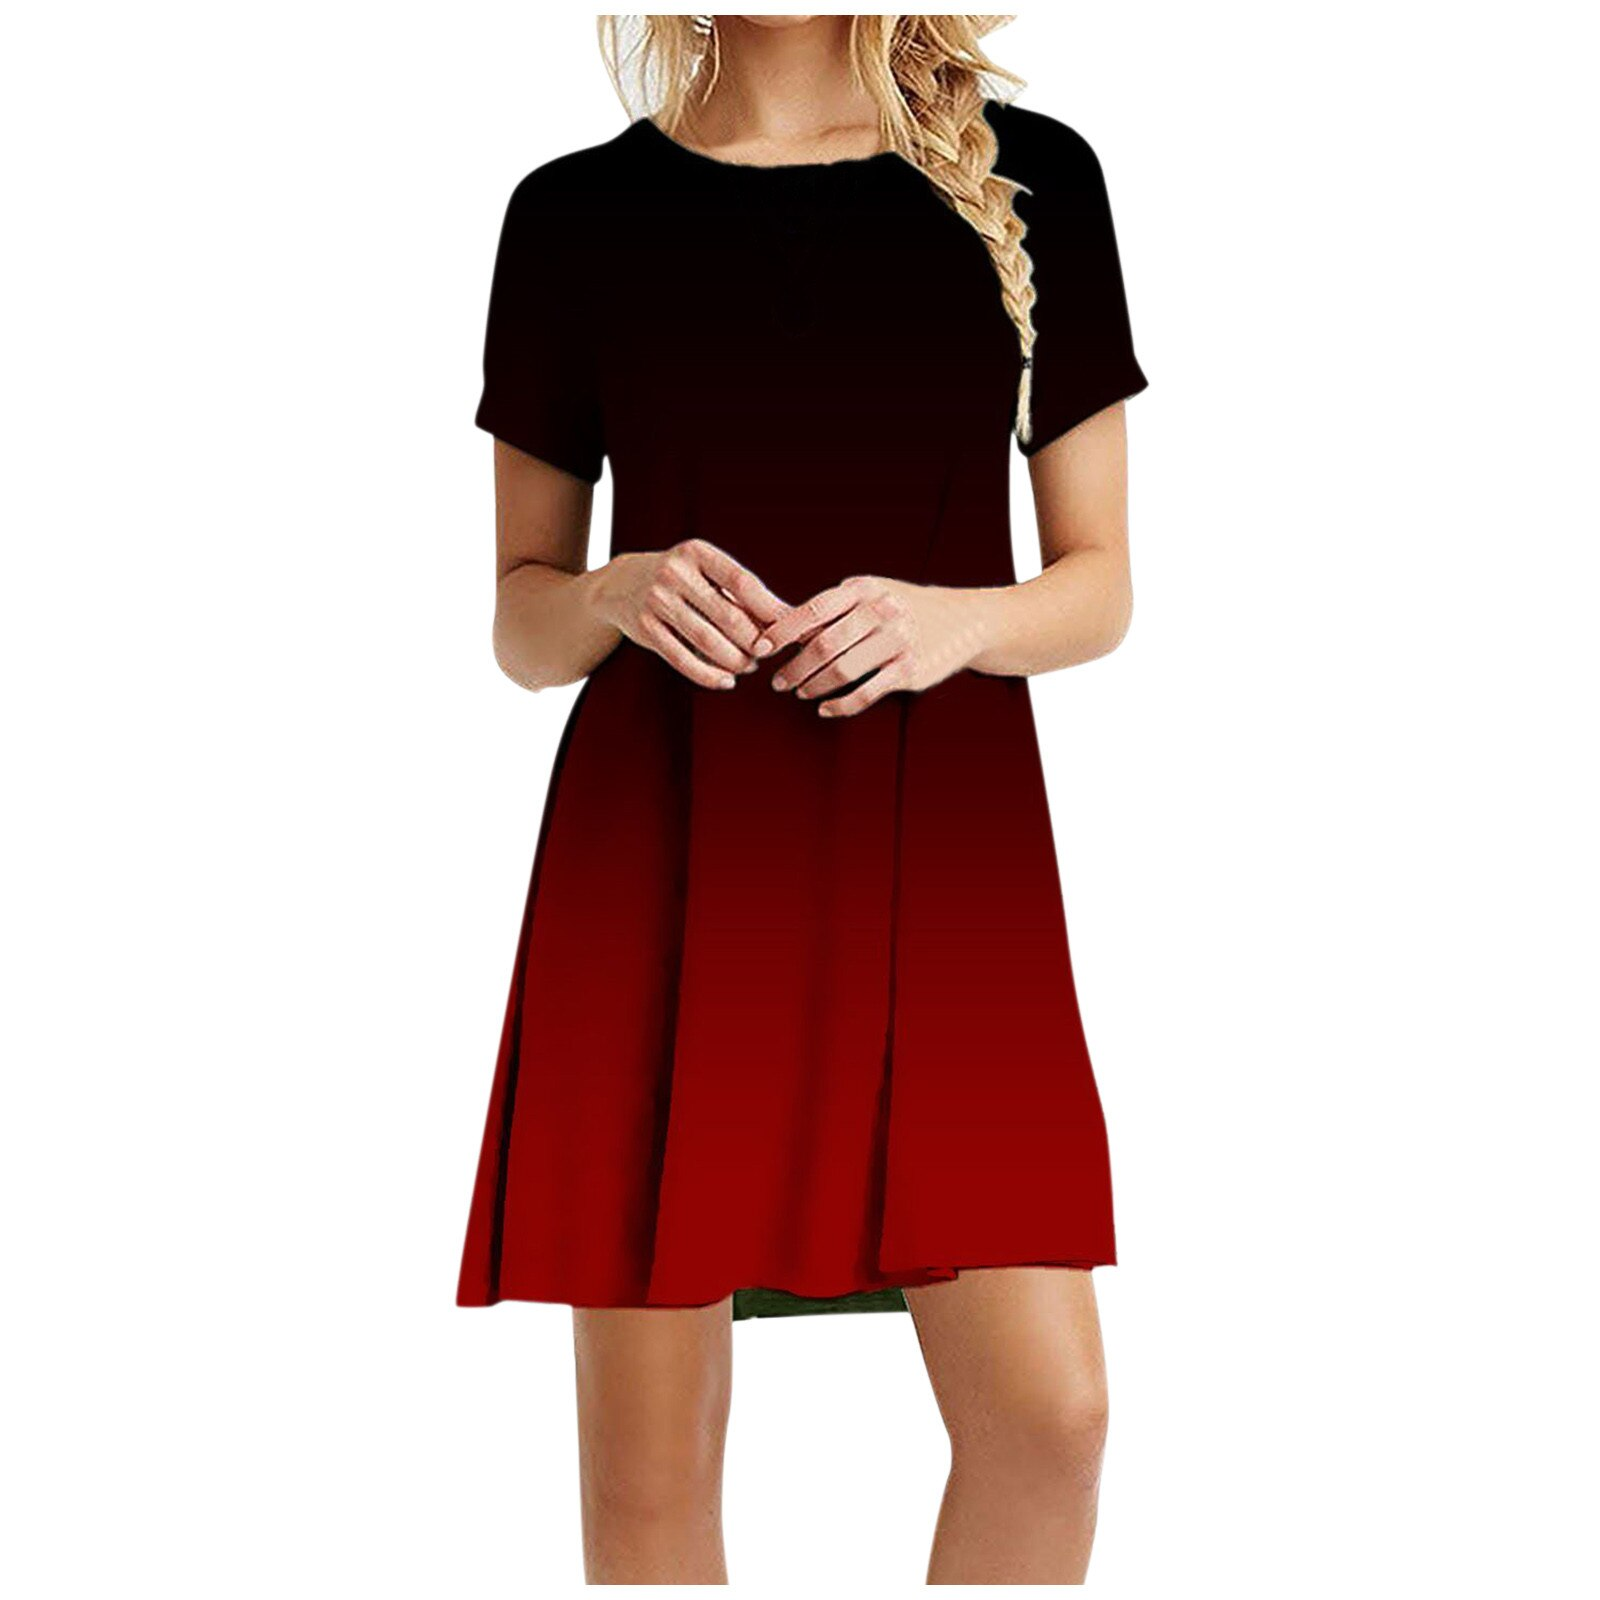 Plus Size Mini Dress Women 2021 Short Sleeve O-neck Dresses Sexy Women Summer Elegant Dresses Office Basic Dress Fenimine C2